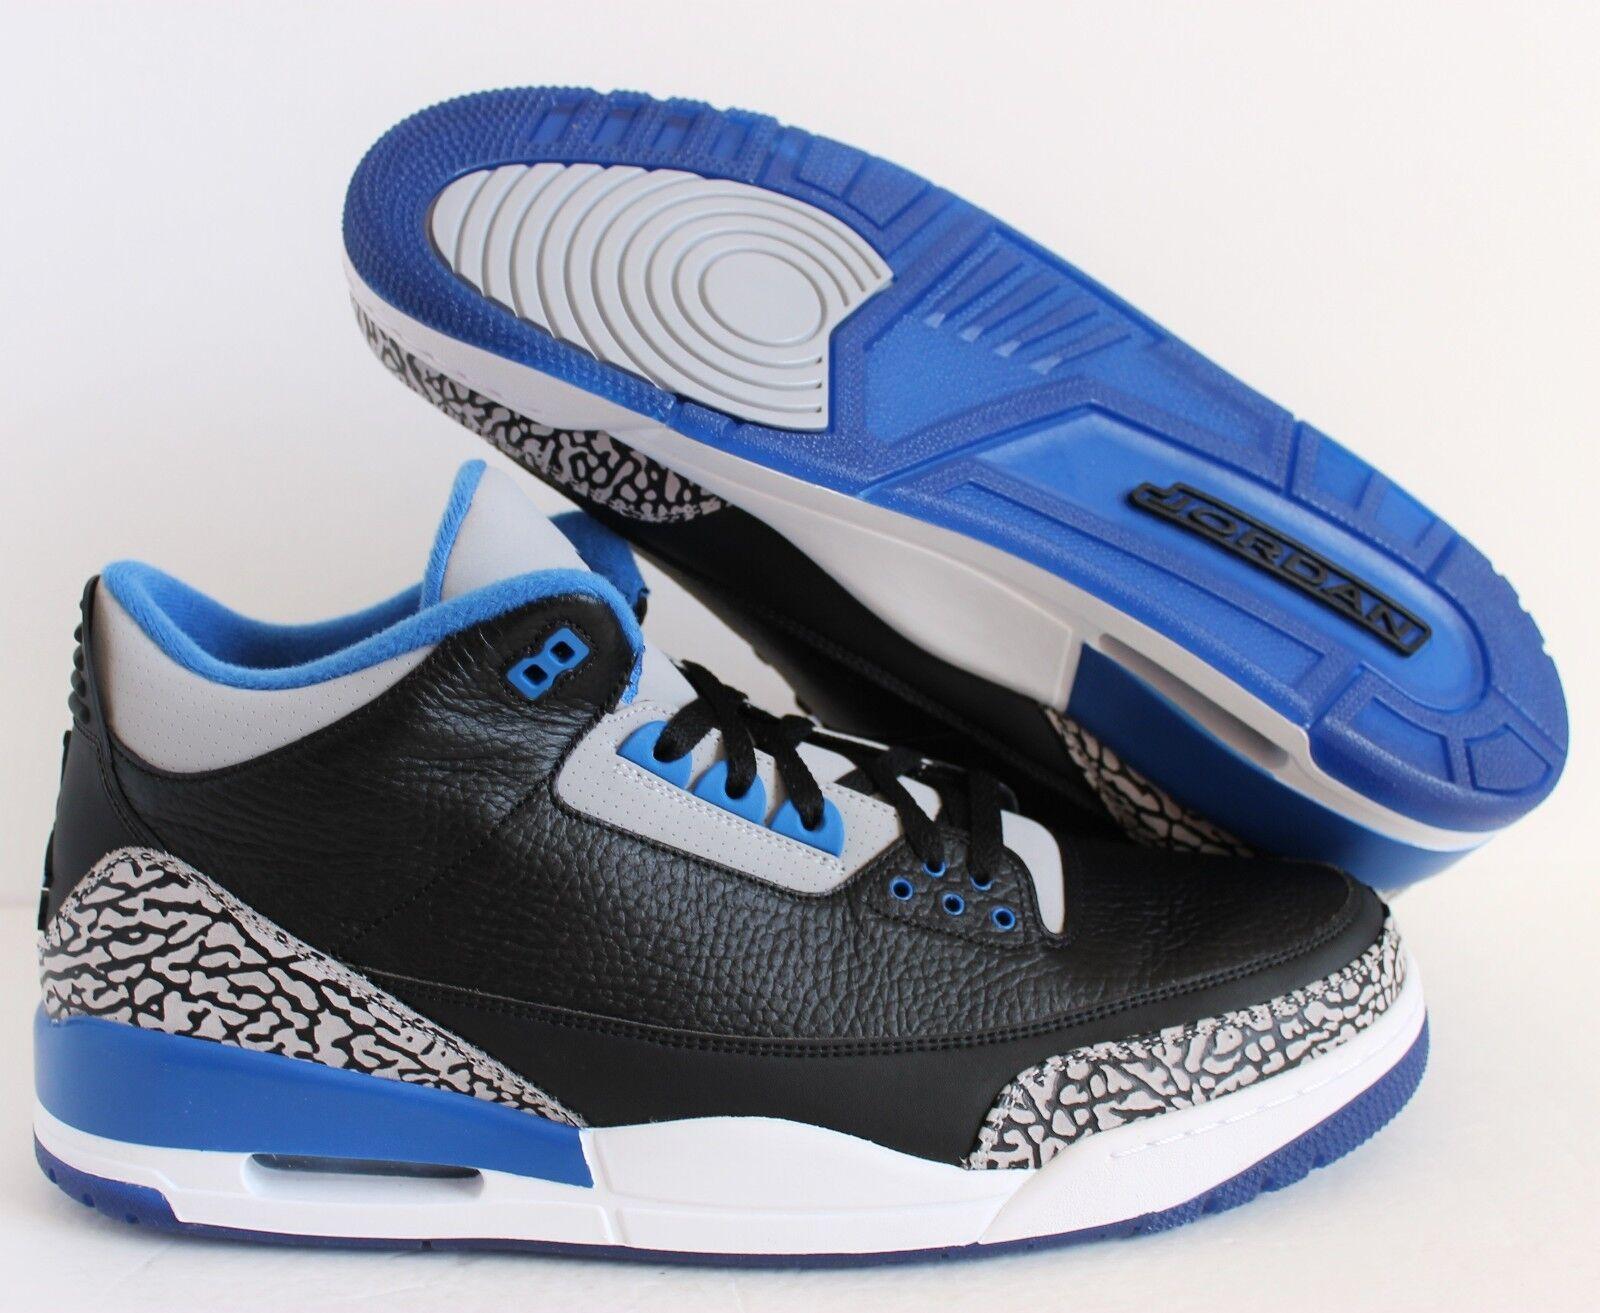 Nike Air Jordan 3 III Retro Black-Sport bluee-White SZ 17 [136064-007]